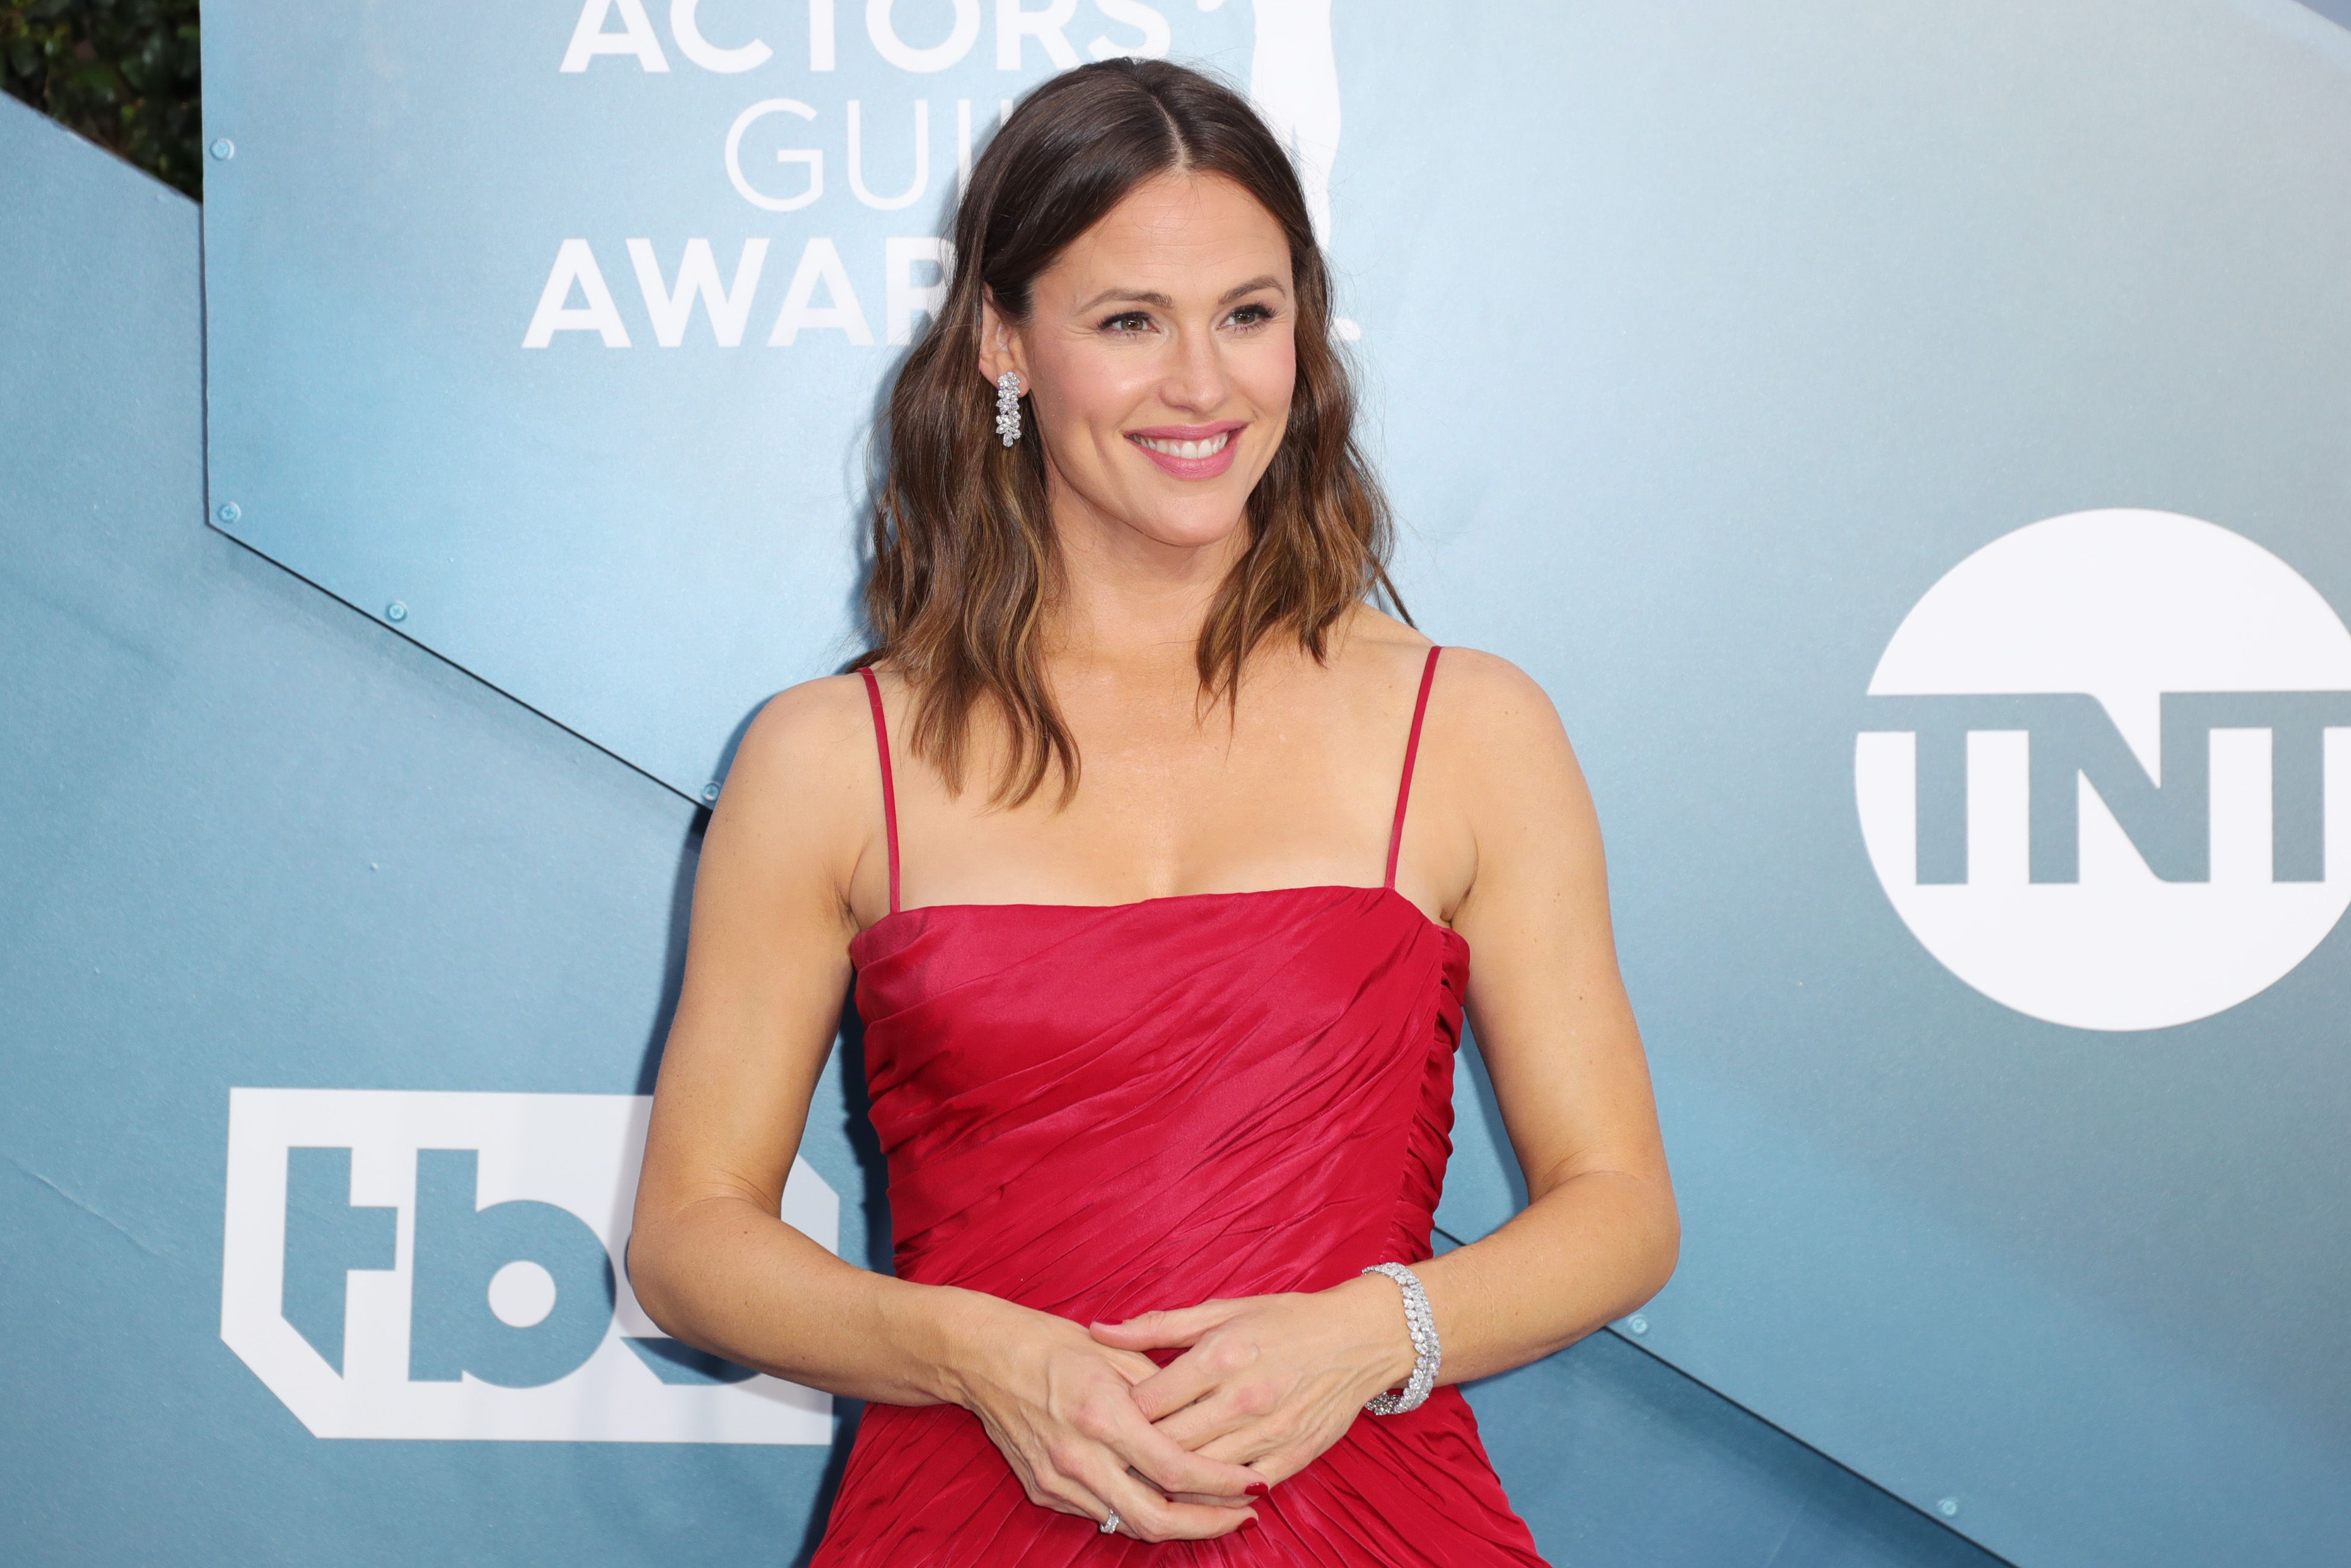 Jennifer Garner looks breath-taking in this designer red dress at an awards event.